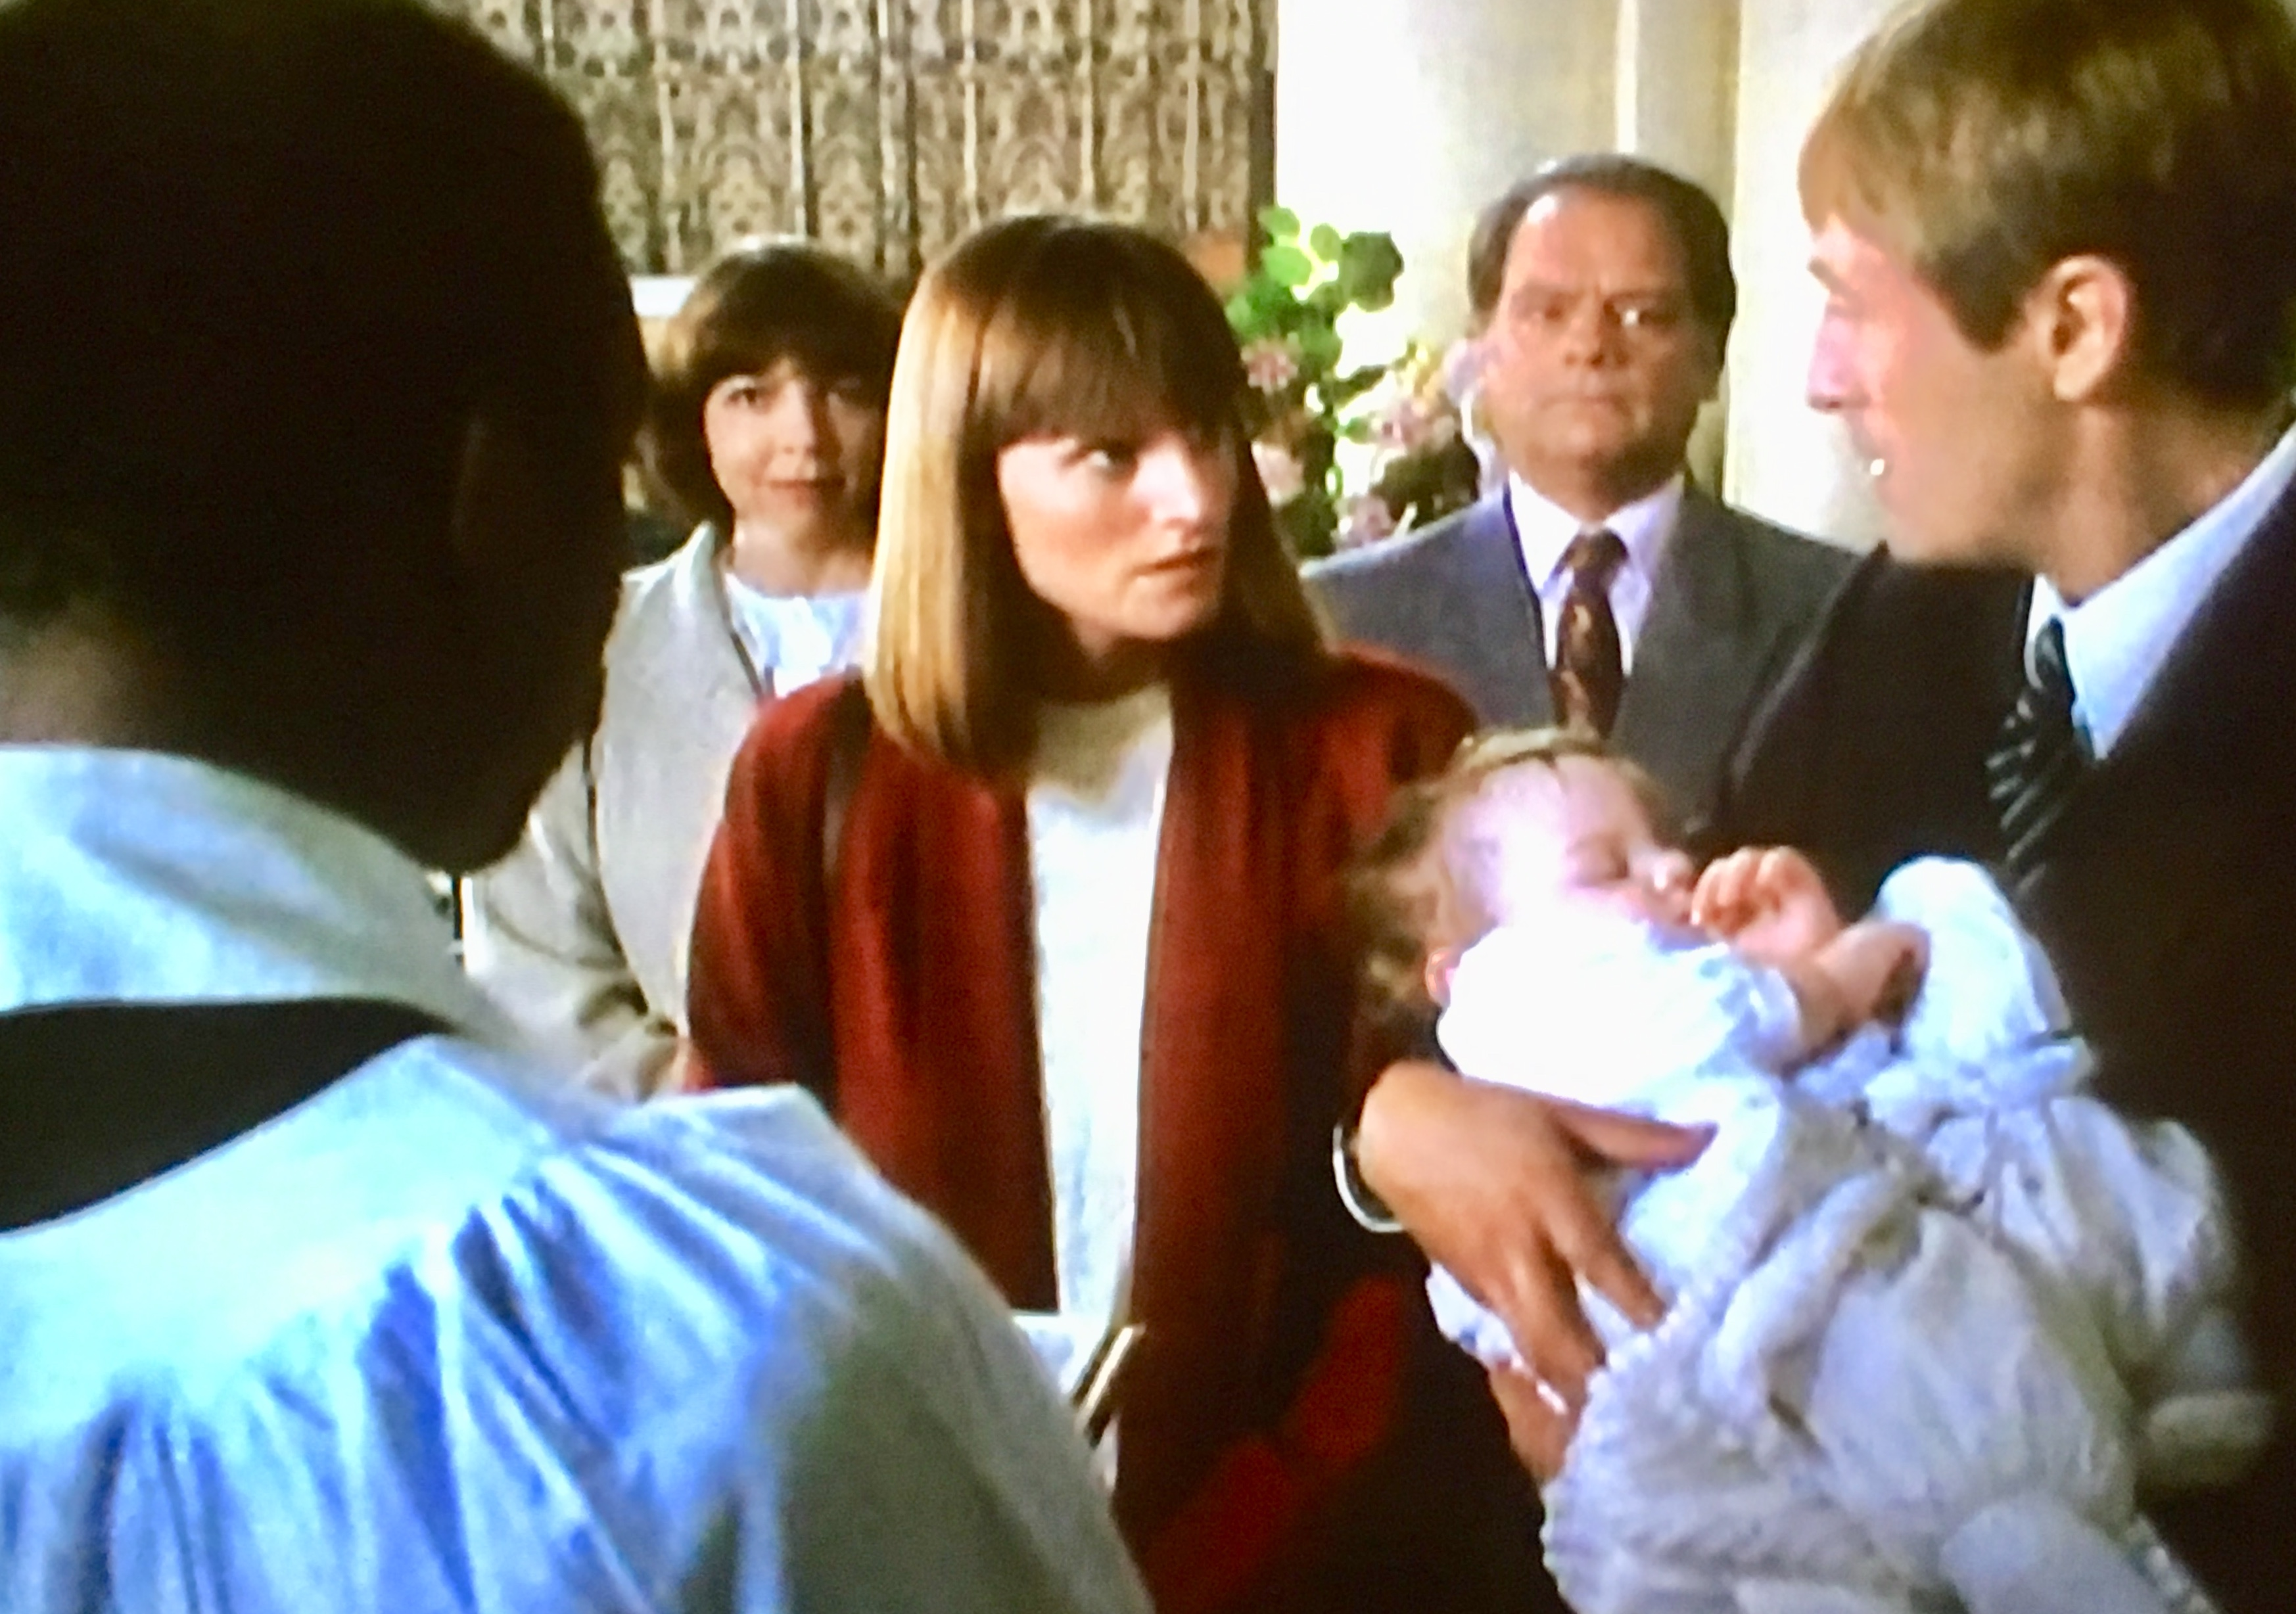 Tom Holland (born 1996) Hot clip Cary Elwes (born 1962),Britt Morgan